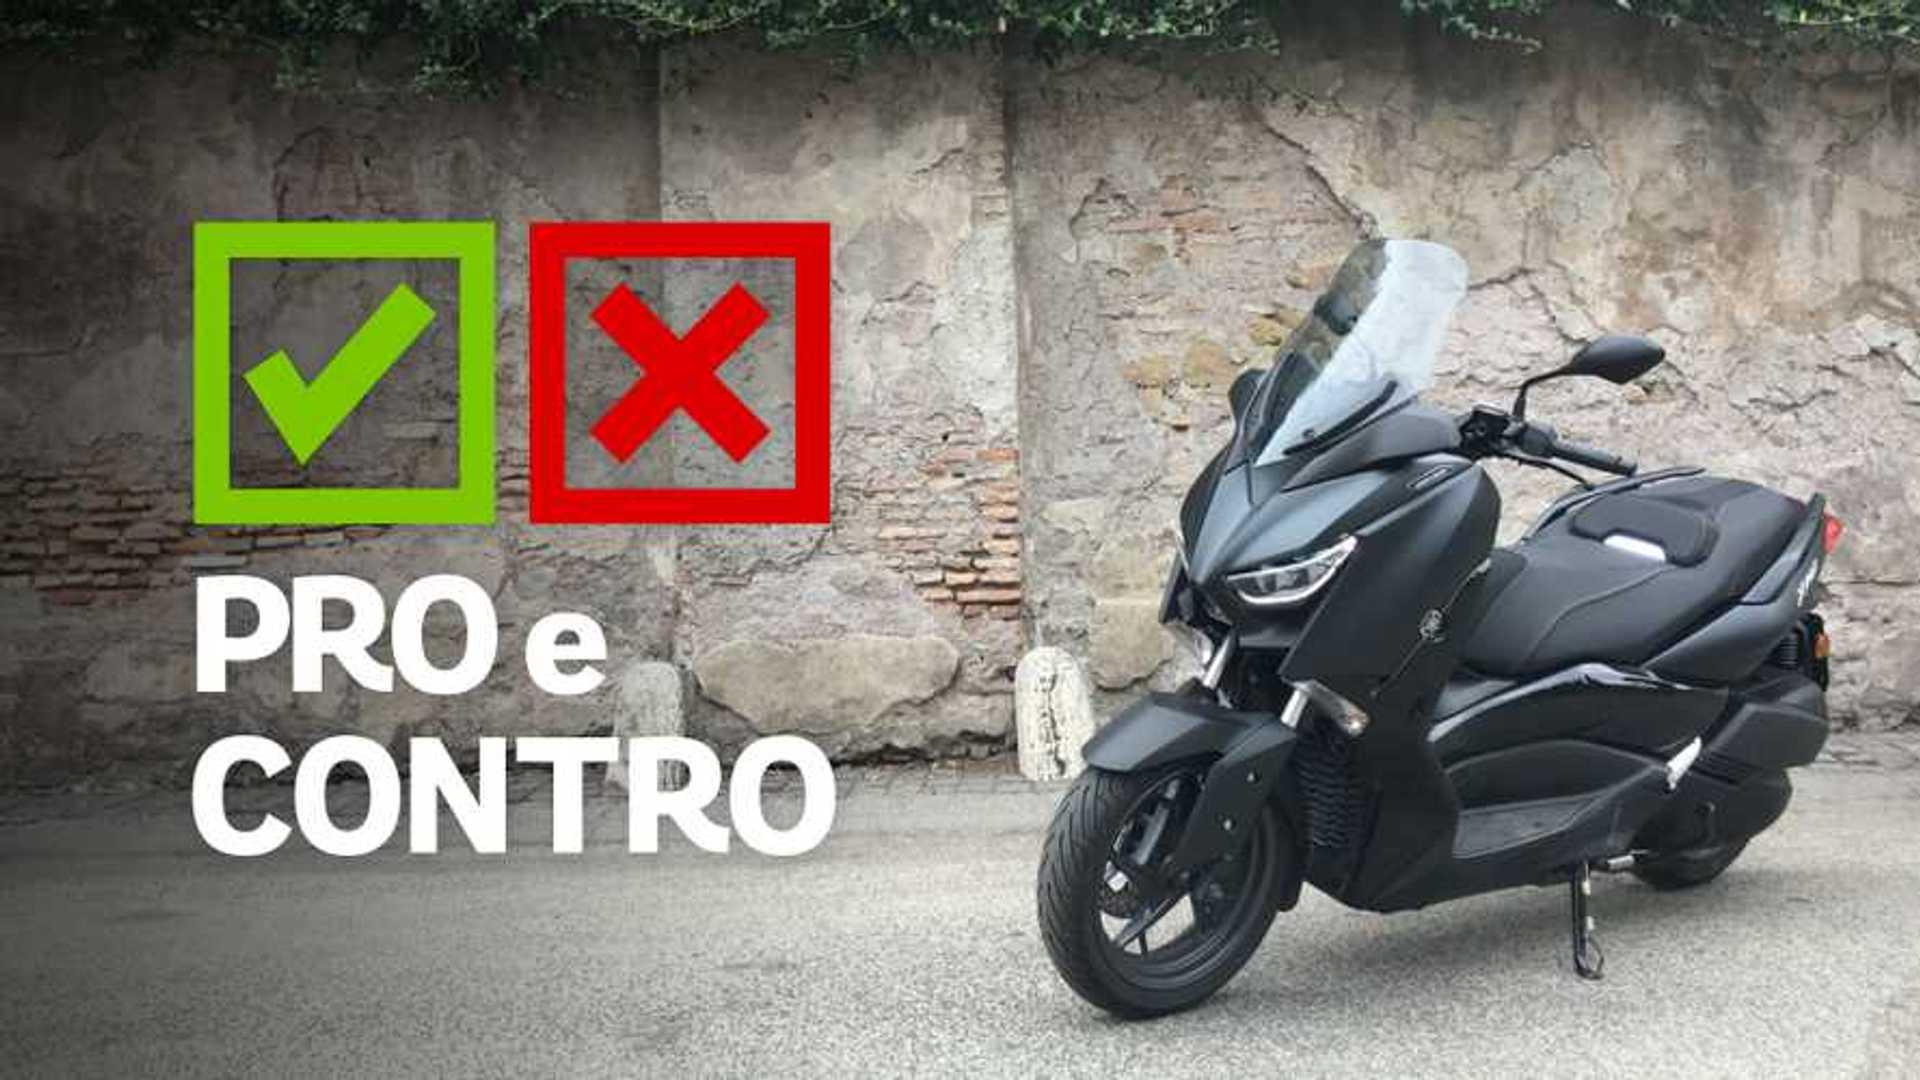 Yamaha XMAX 300 Iron Max, pro e contro